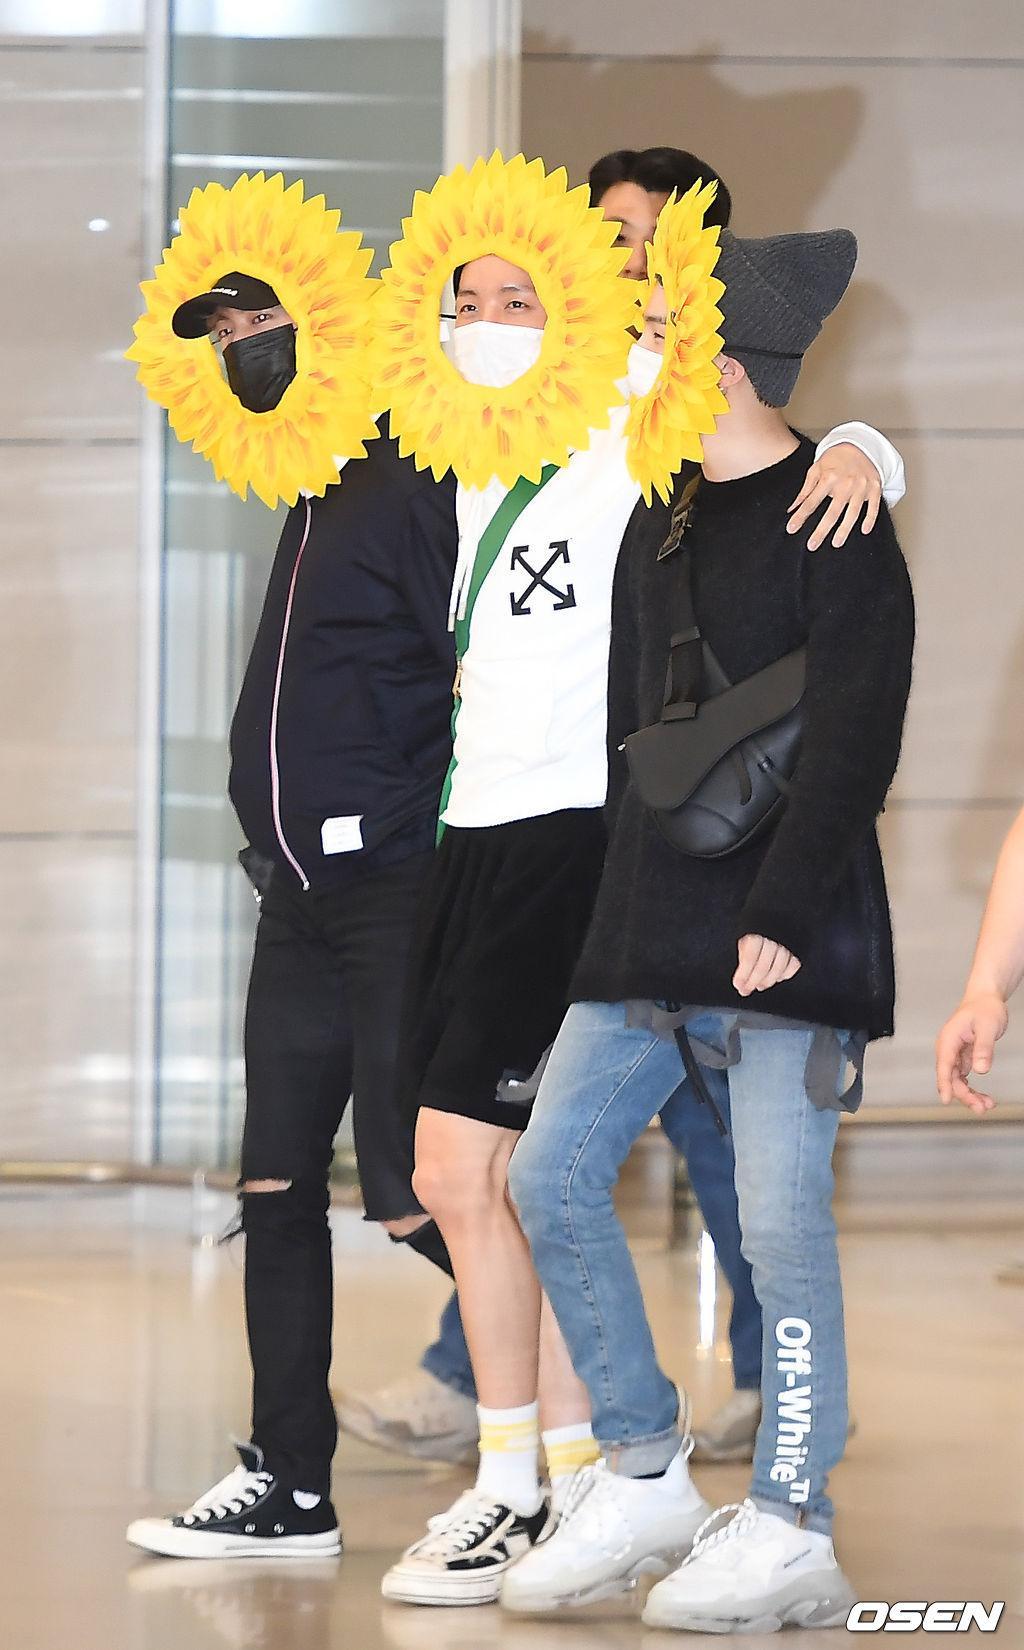 bts, bts profile, bts facts, bts height, bts age, bts members, bts leader, bts age, bts punishment, bts sunflower, bts airport, bts comeback, bts korea